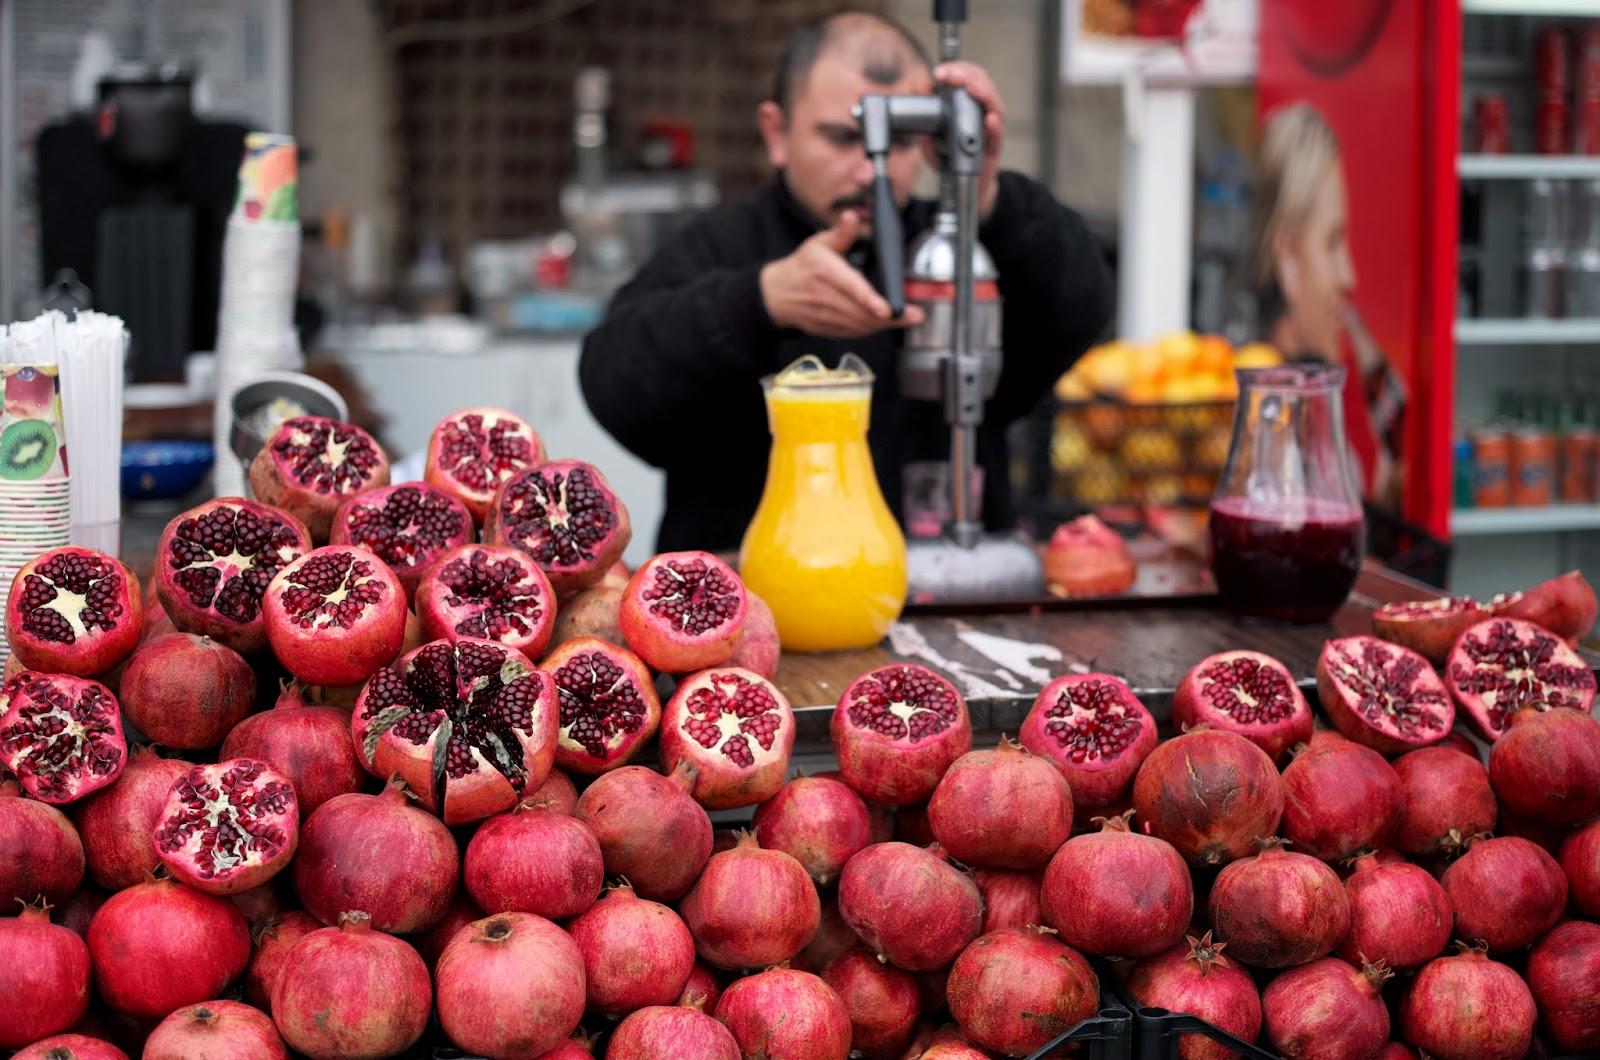 FRESH SQUEEZED POMEGRANATE AND ORANGE JUICE (PHOTO COURTEY OF GLOBAL GOOD FOOD)